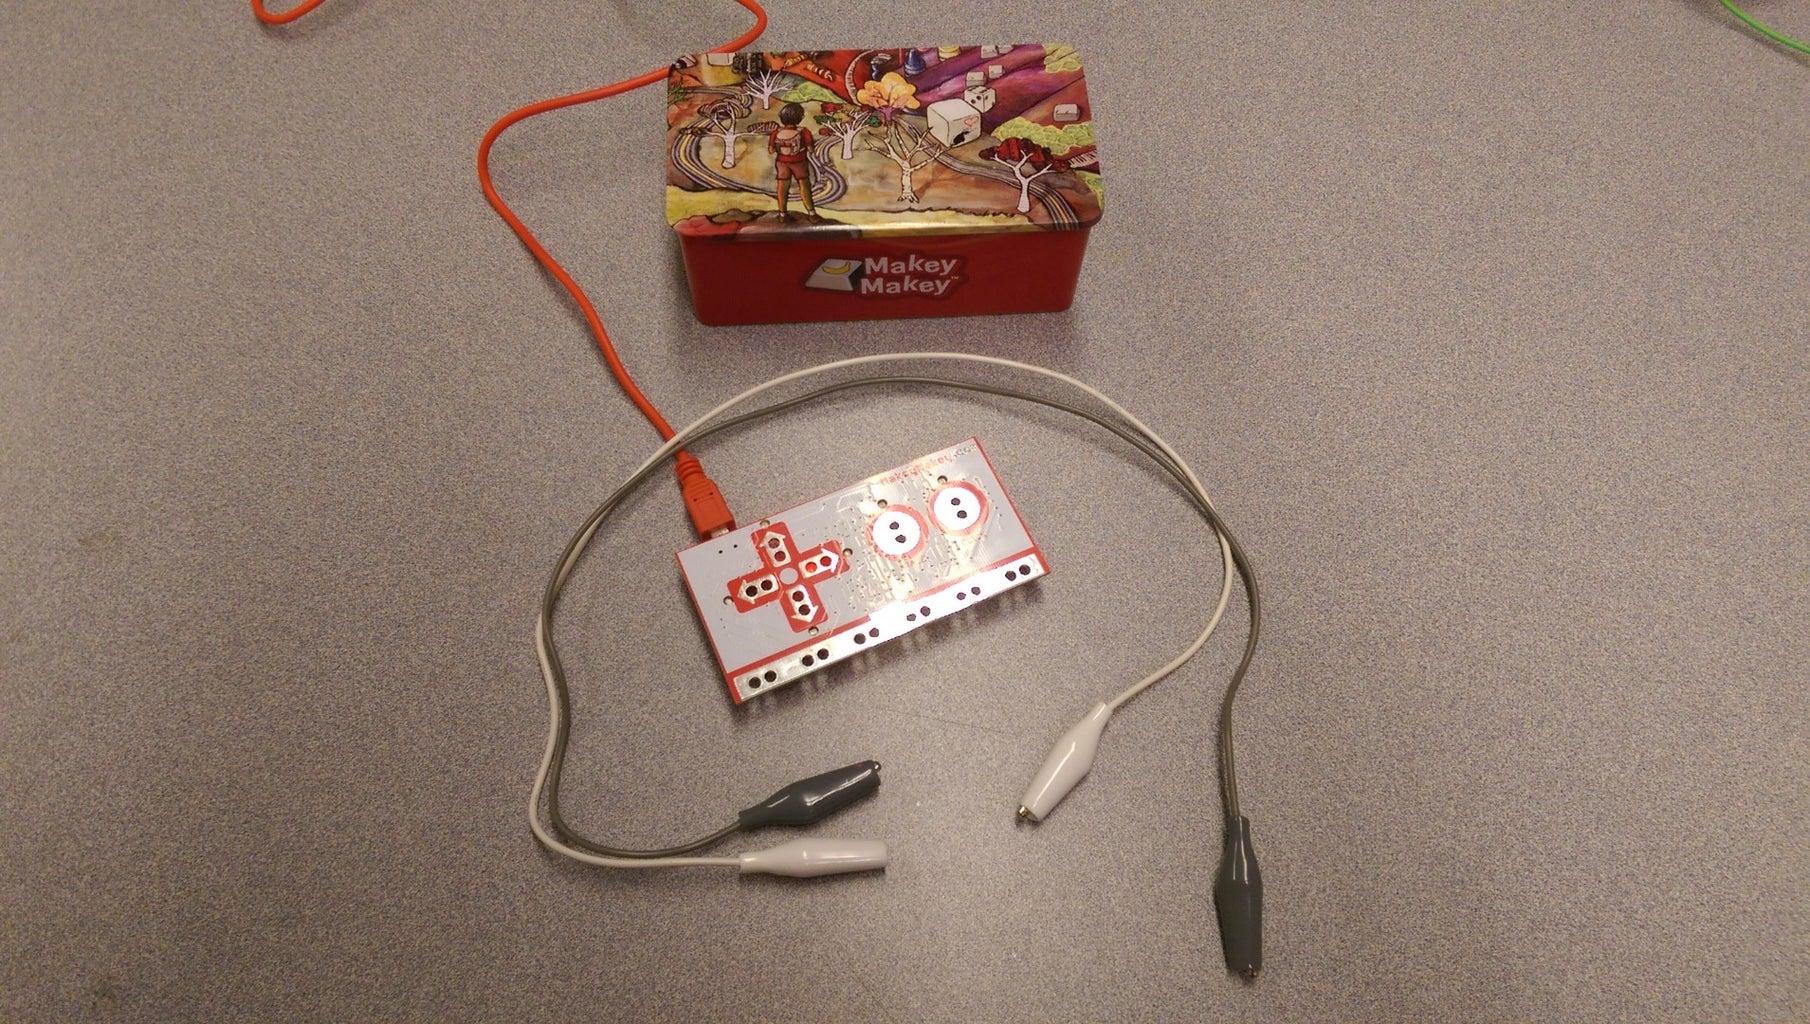 Hands Free MaKey MaKey Ground Bracelet